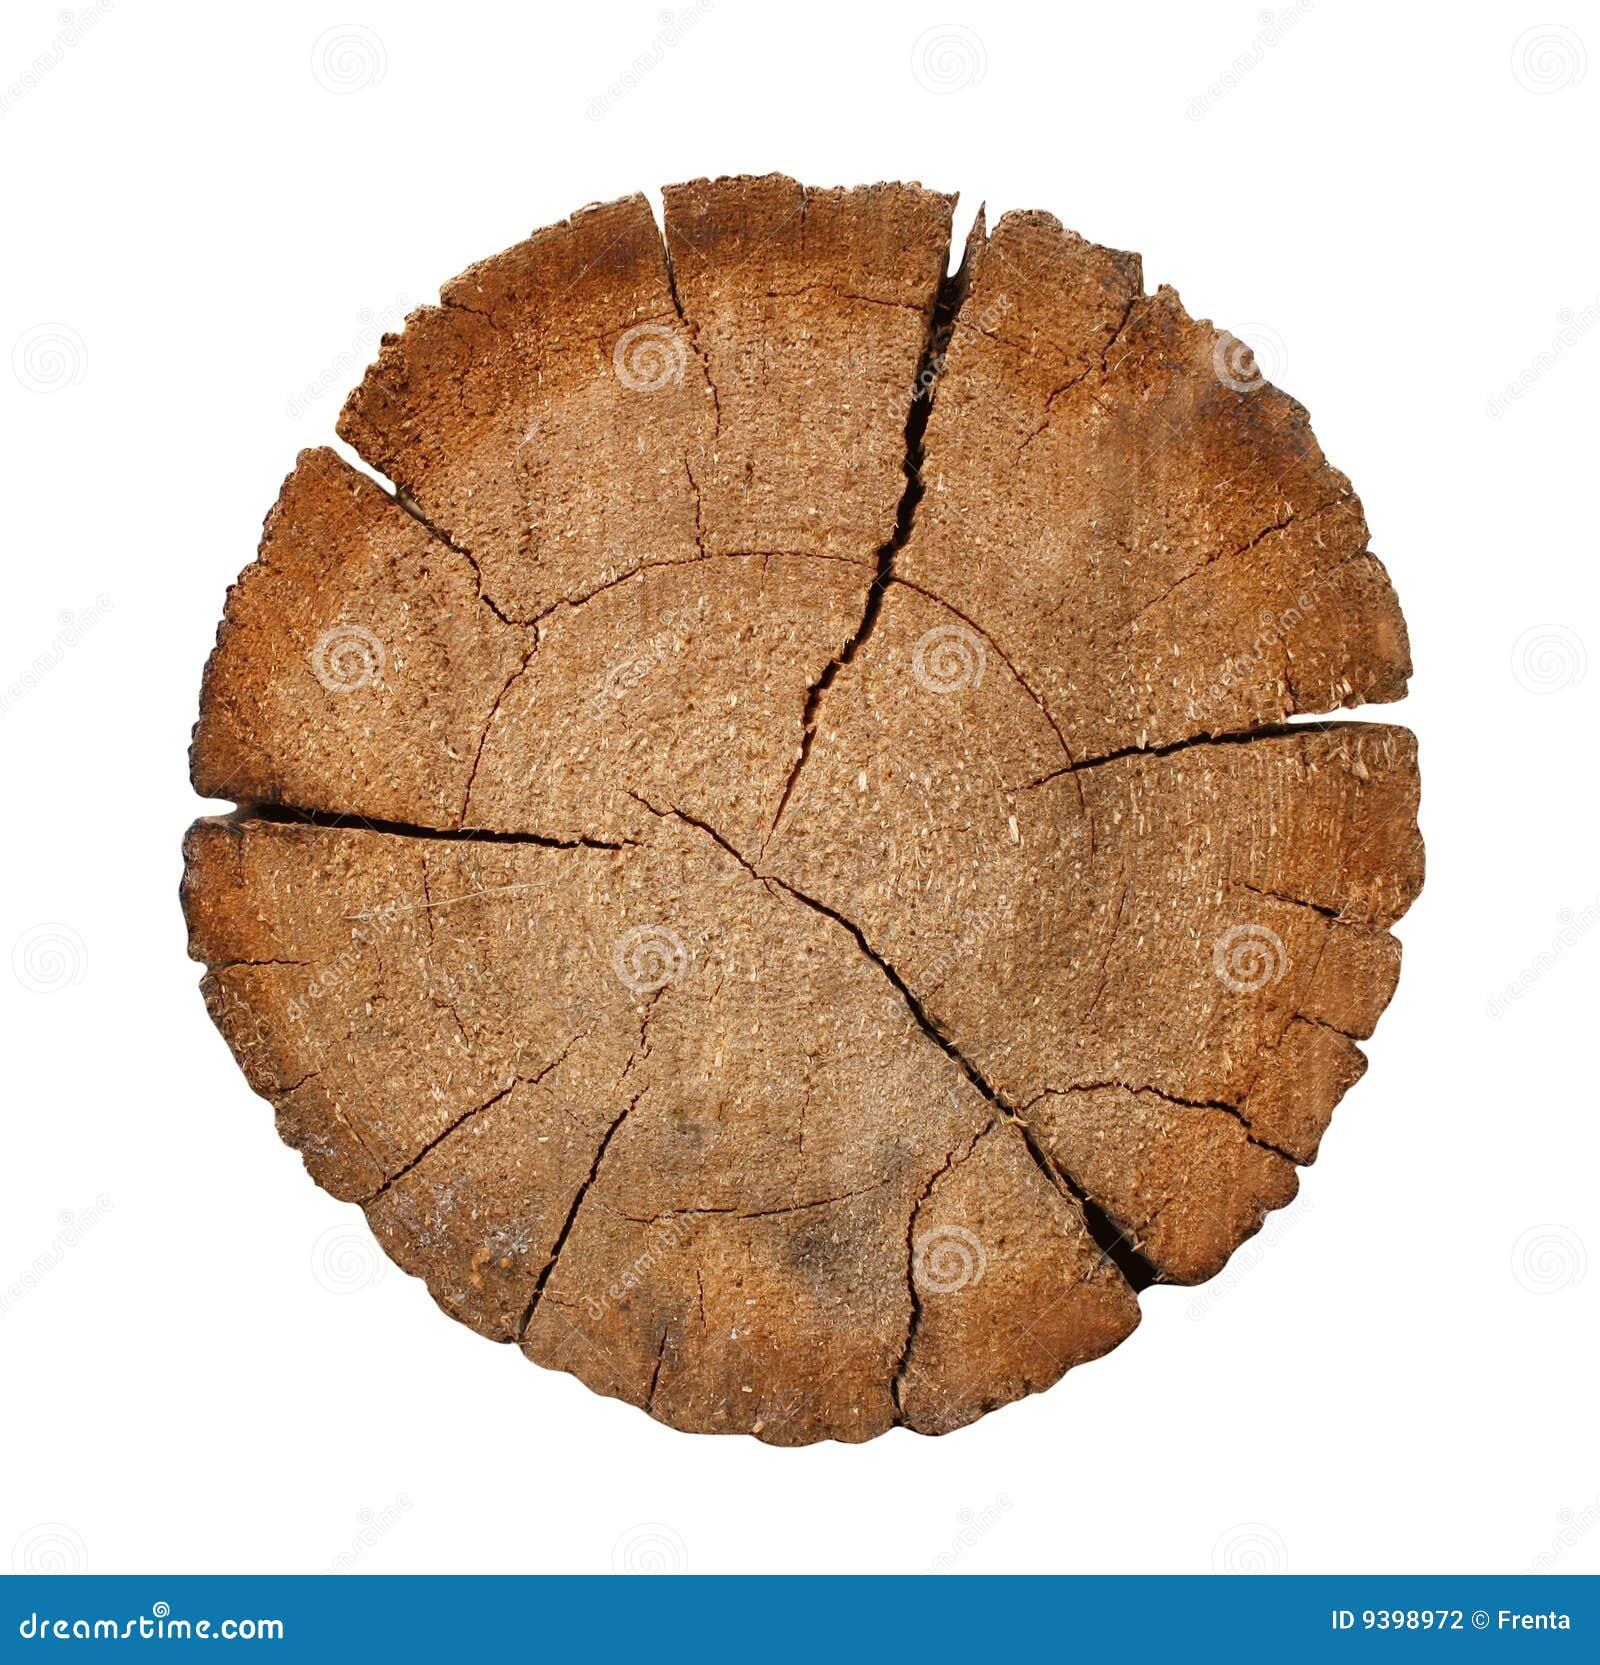 Cutting A Log : Cut of a log stock photo image environmental growth